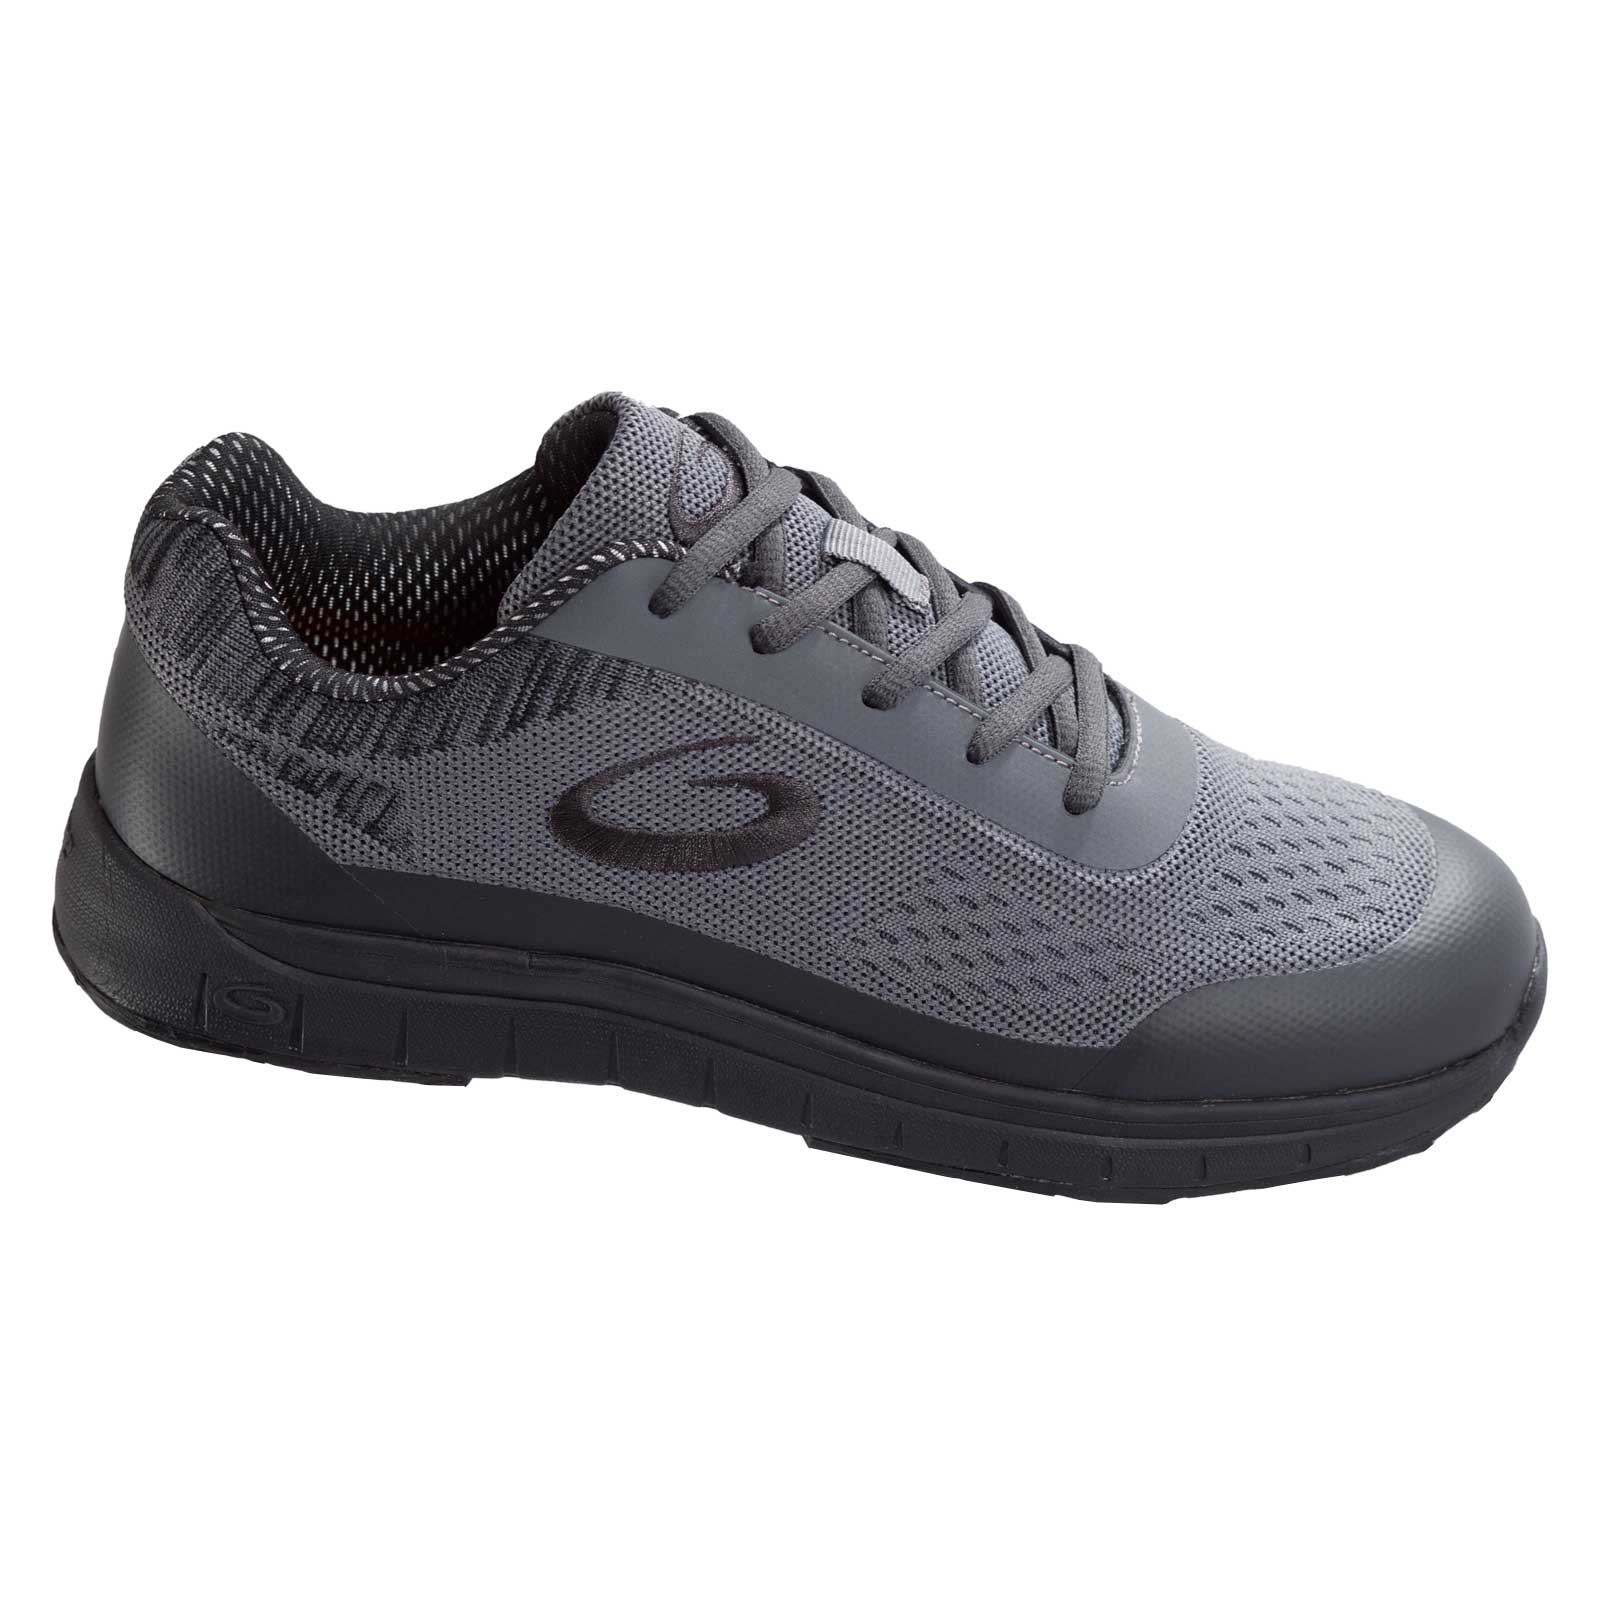 Curling Supplies Supplies ShoesGoldline Curling Curling ShoesGoldline ShoesGoldline QBdtsxChr